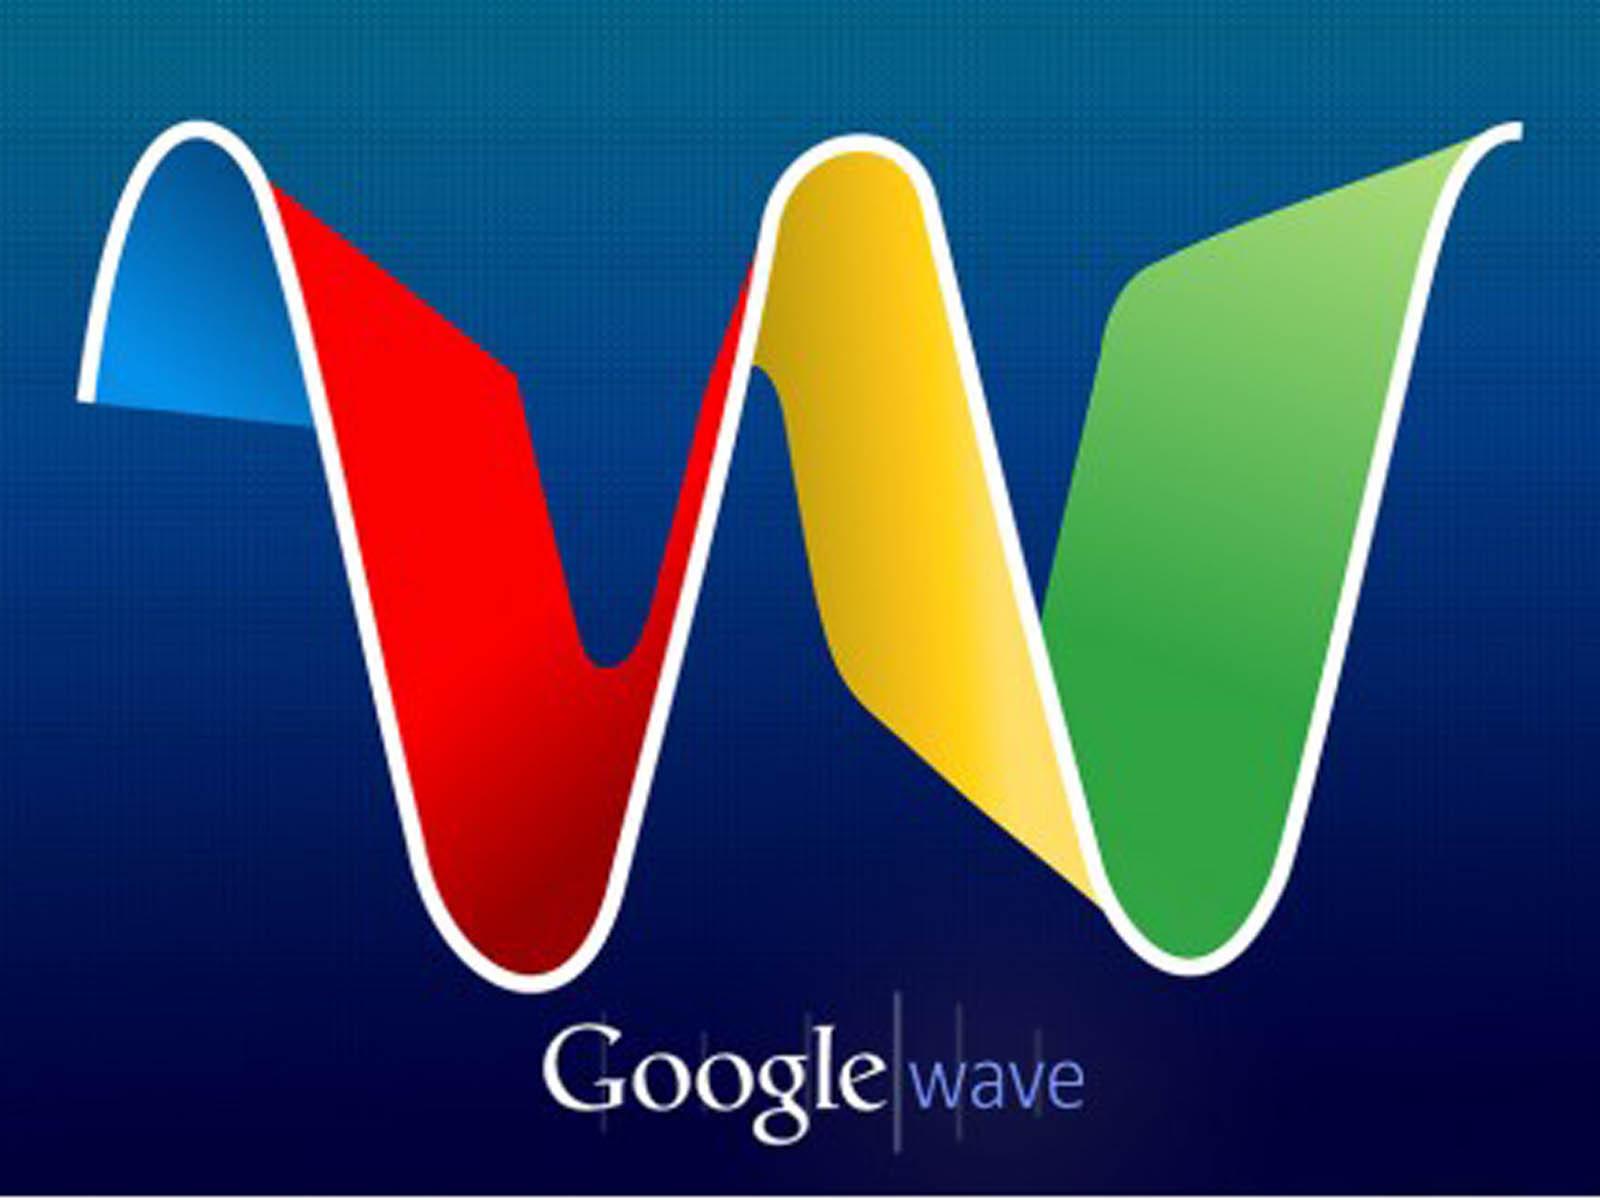 Google Free Desktop Backgrounds - WallpaperSafari